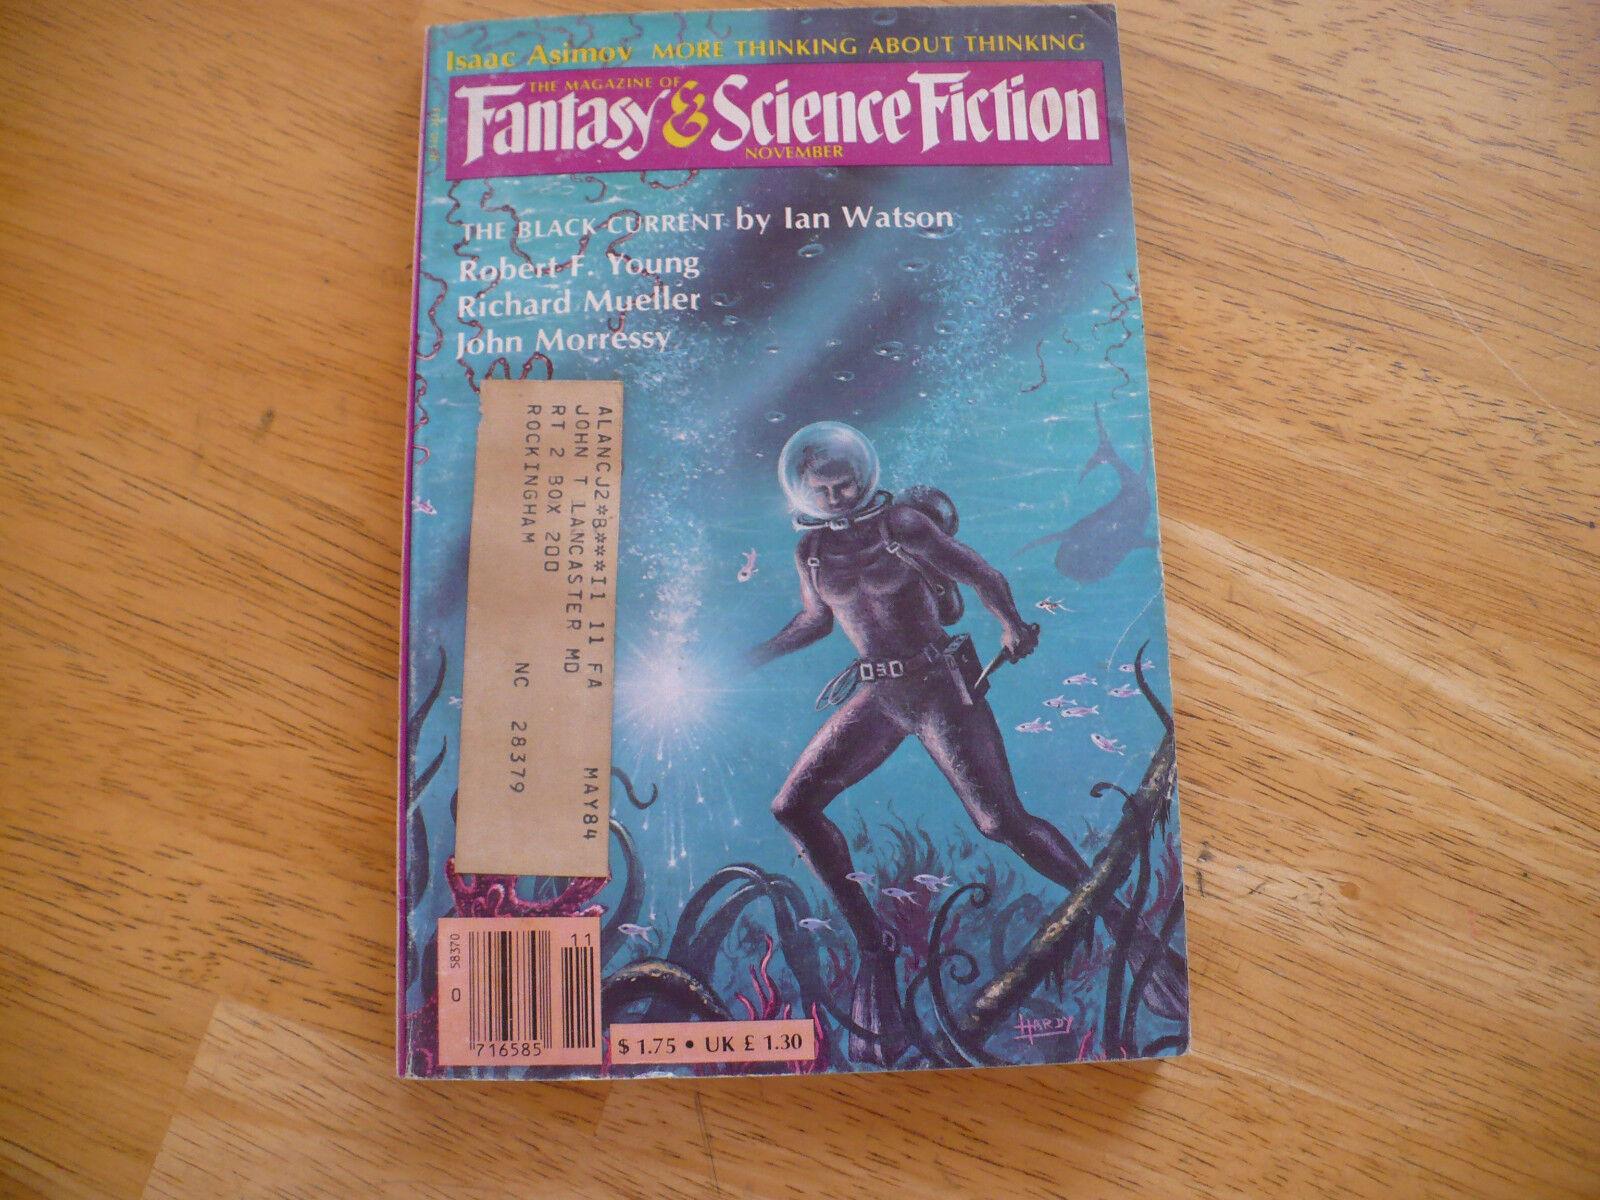 MAGAZINE OF FANTASY & SCIENCE FICTION - WHOLE # 390 - VOL 65